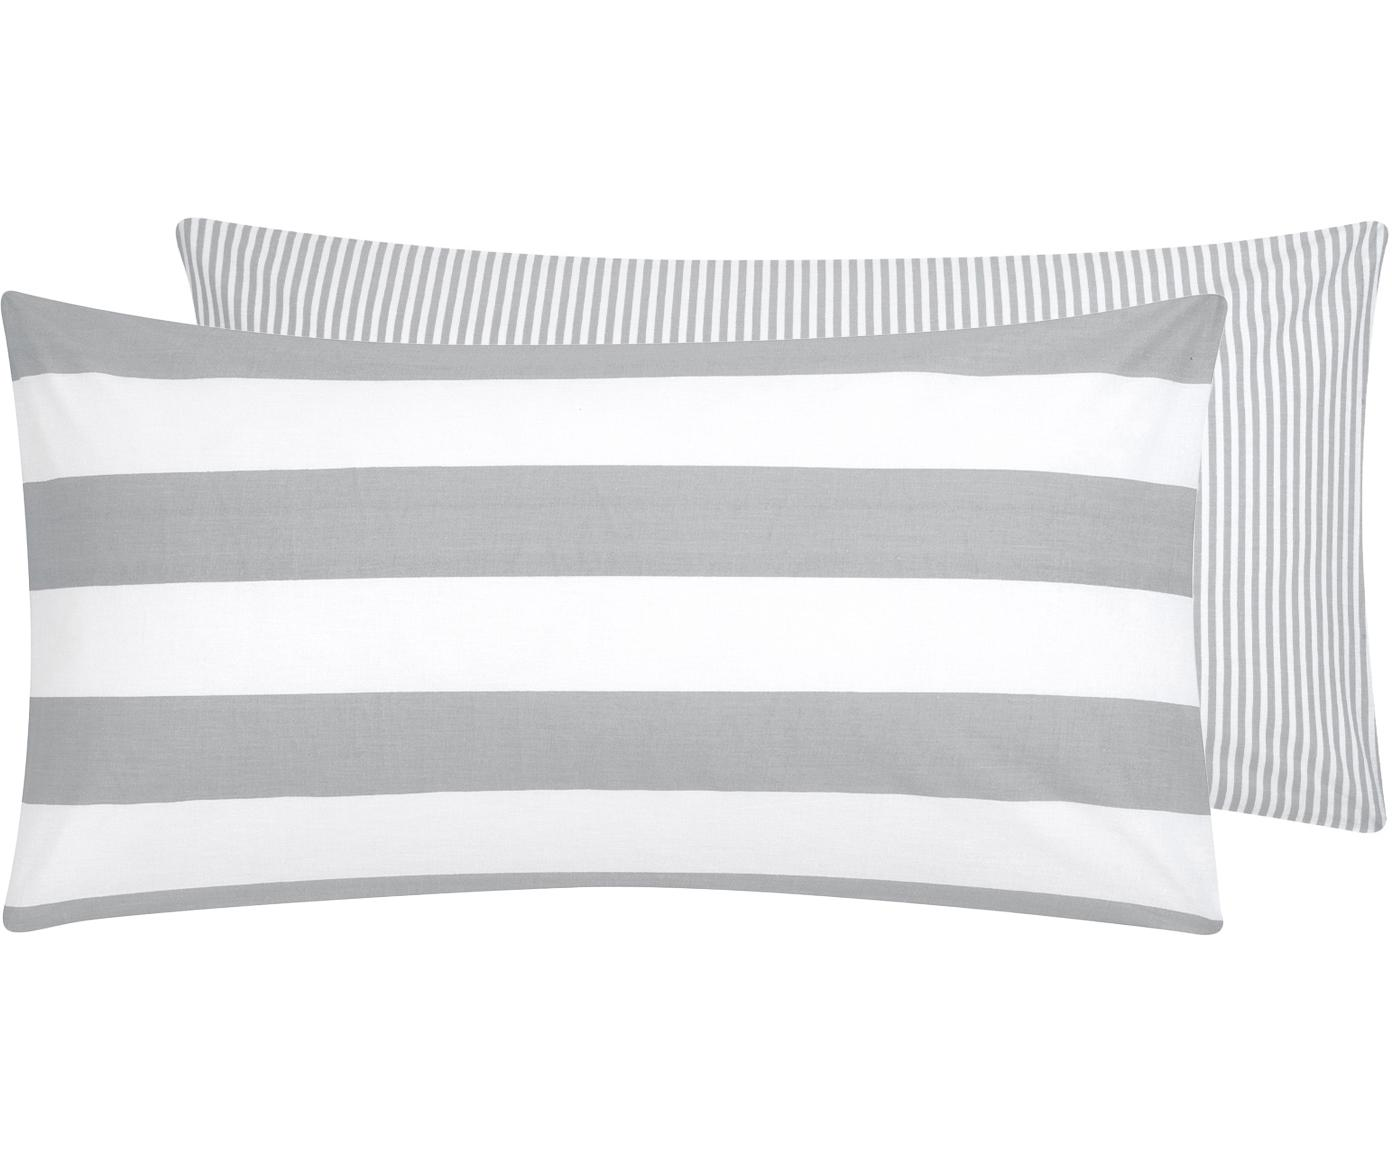 Funda de almohada de tejido renforcé Lorena, caras distintas, Gris claro, crema, An 45 x L 85 cm